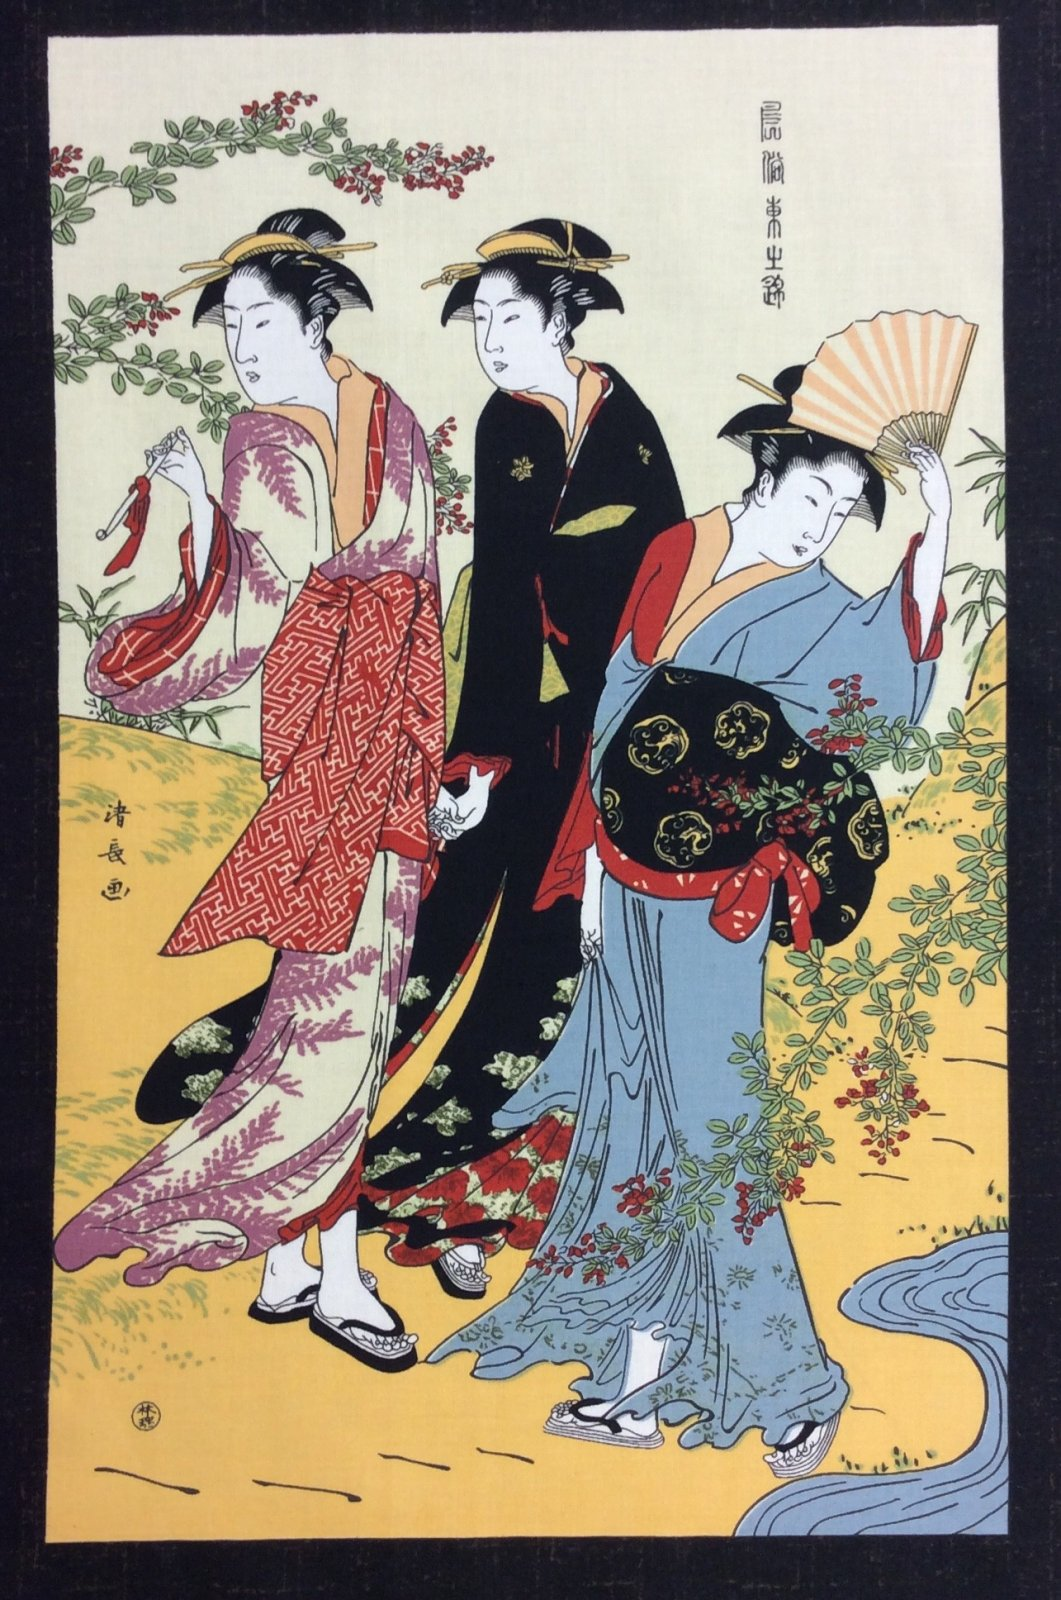 Kona Bay Geisha Portraits Japanese Asian Kona Bay Kabuki Theater Geisha PANEL Cotton Quilt Fabric KB17